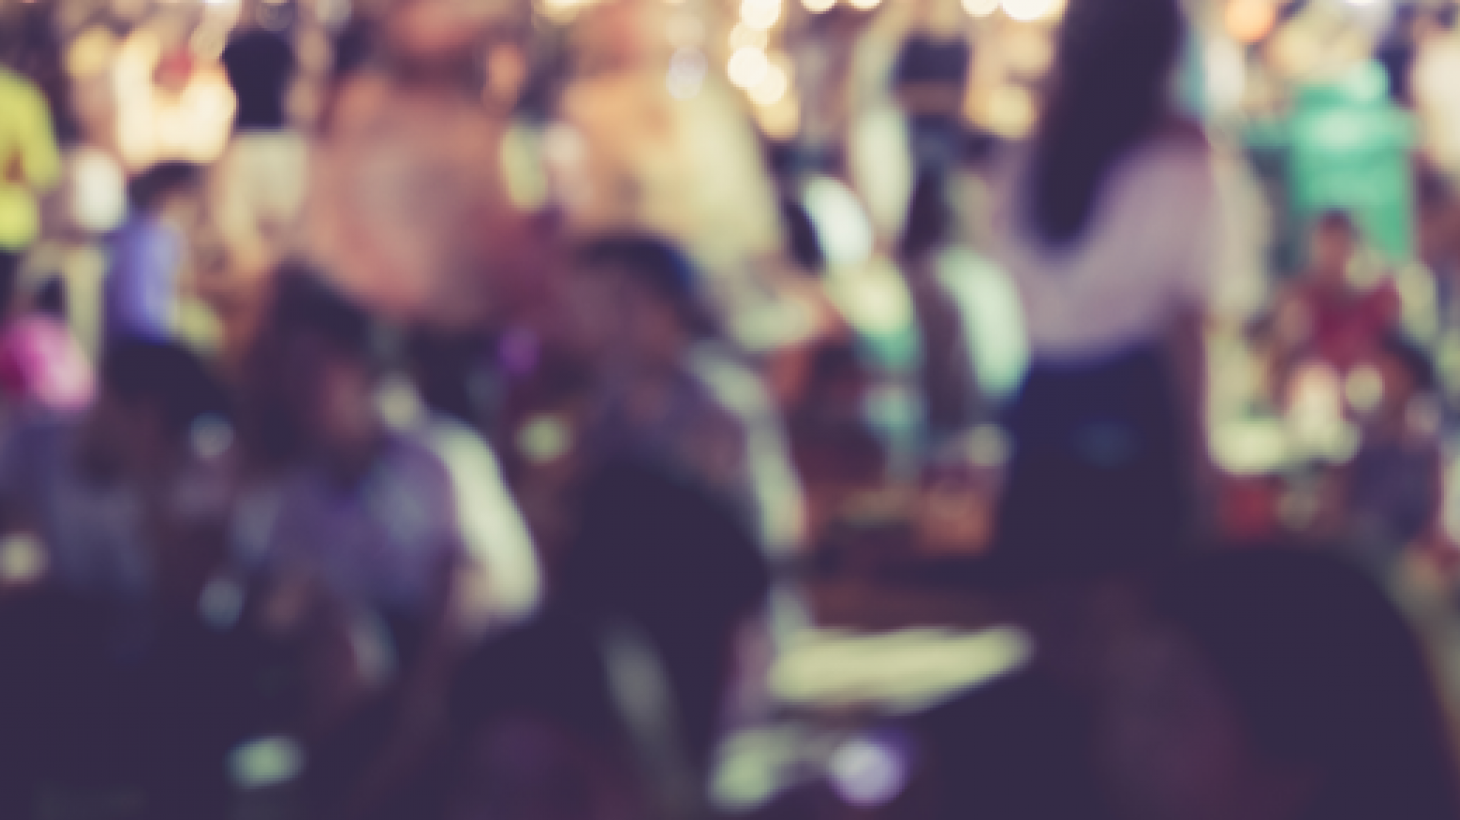 Our Favorite Volunteer Prizes and Thank You Gift Ideas for Your Golf on fun kitchen ideas, fun camping ideas, fun pool ideas, fun family ideas, fun furniture ideas, fun exercise ideas, fun beach ideas, fun games ideas, fun gardening ideas, fun lake ideas, fun photography ideas, fun safety ideas, fun art ideas, fun bowling ideas, fun cooking ideas, fun cheerleading ideas, fun restaurant ideas, fun home ideas, fun business ideas, fun marketing ideas,